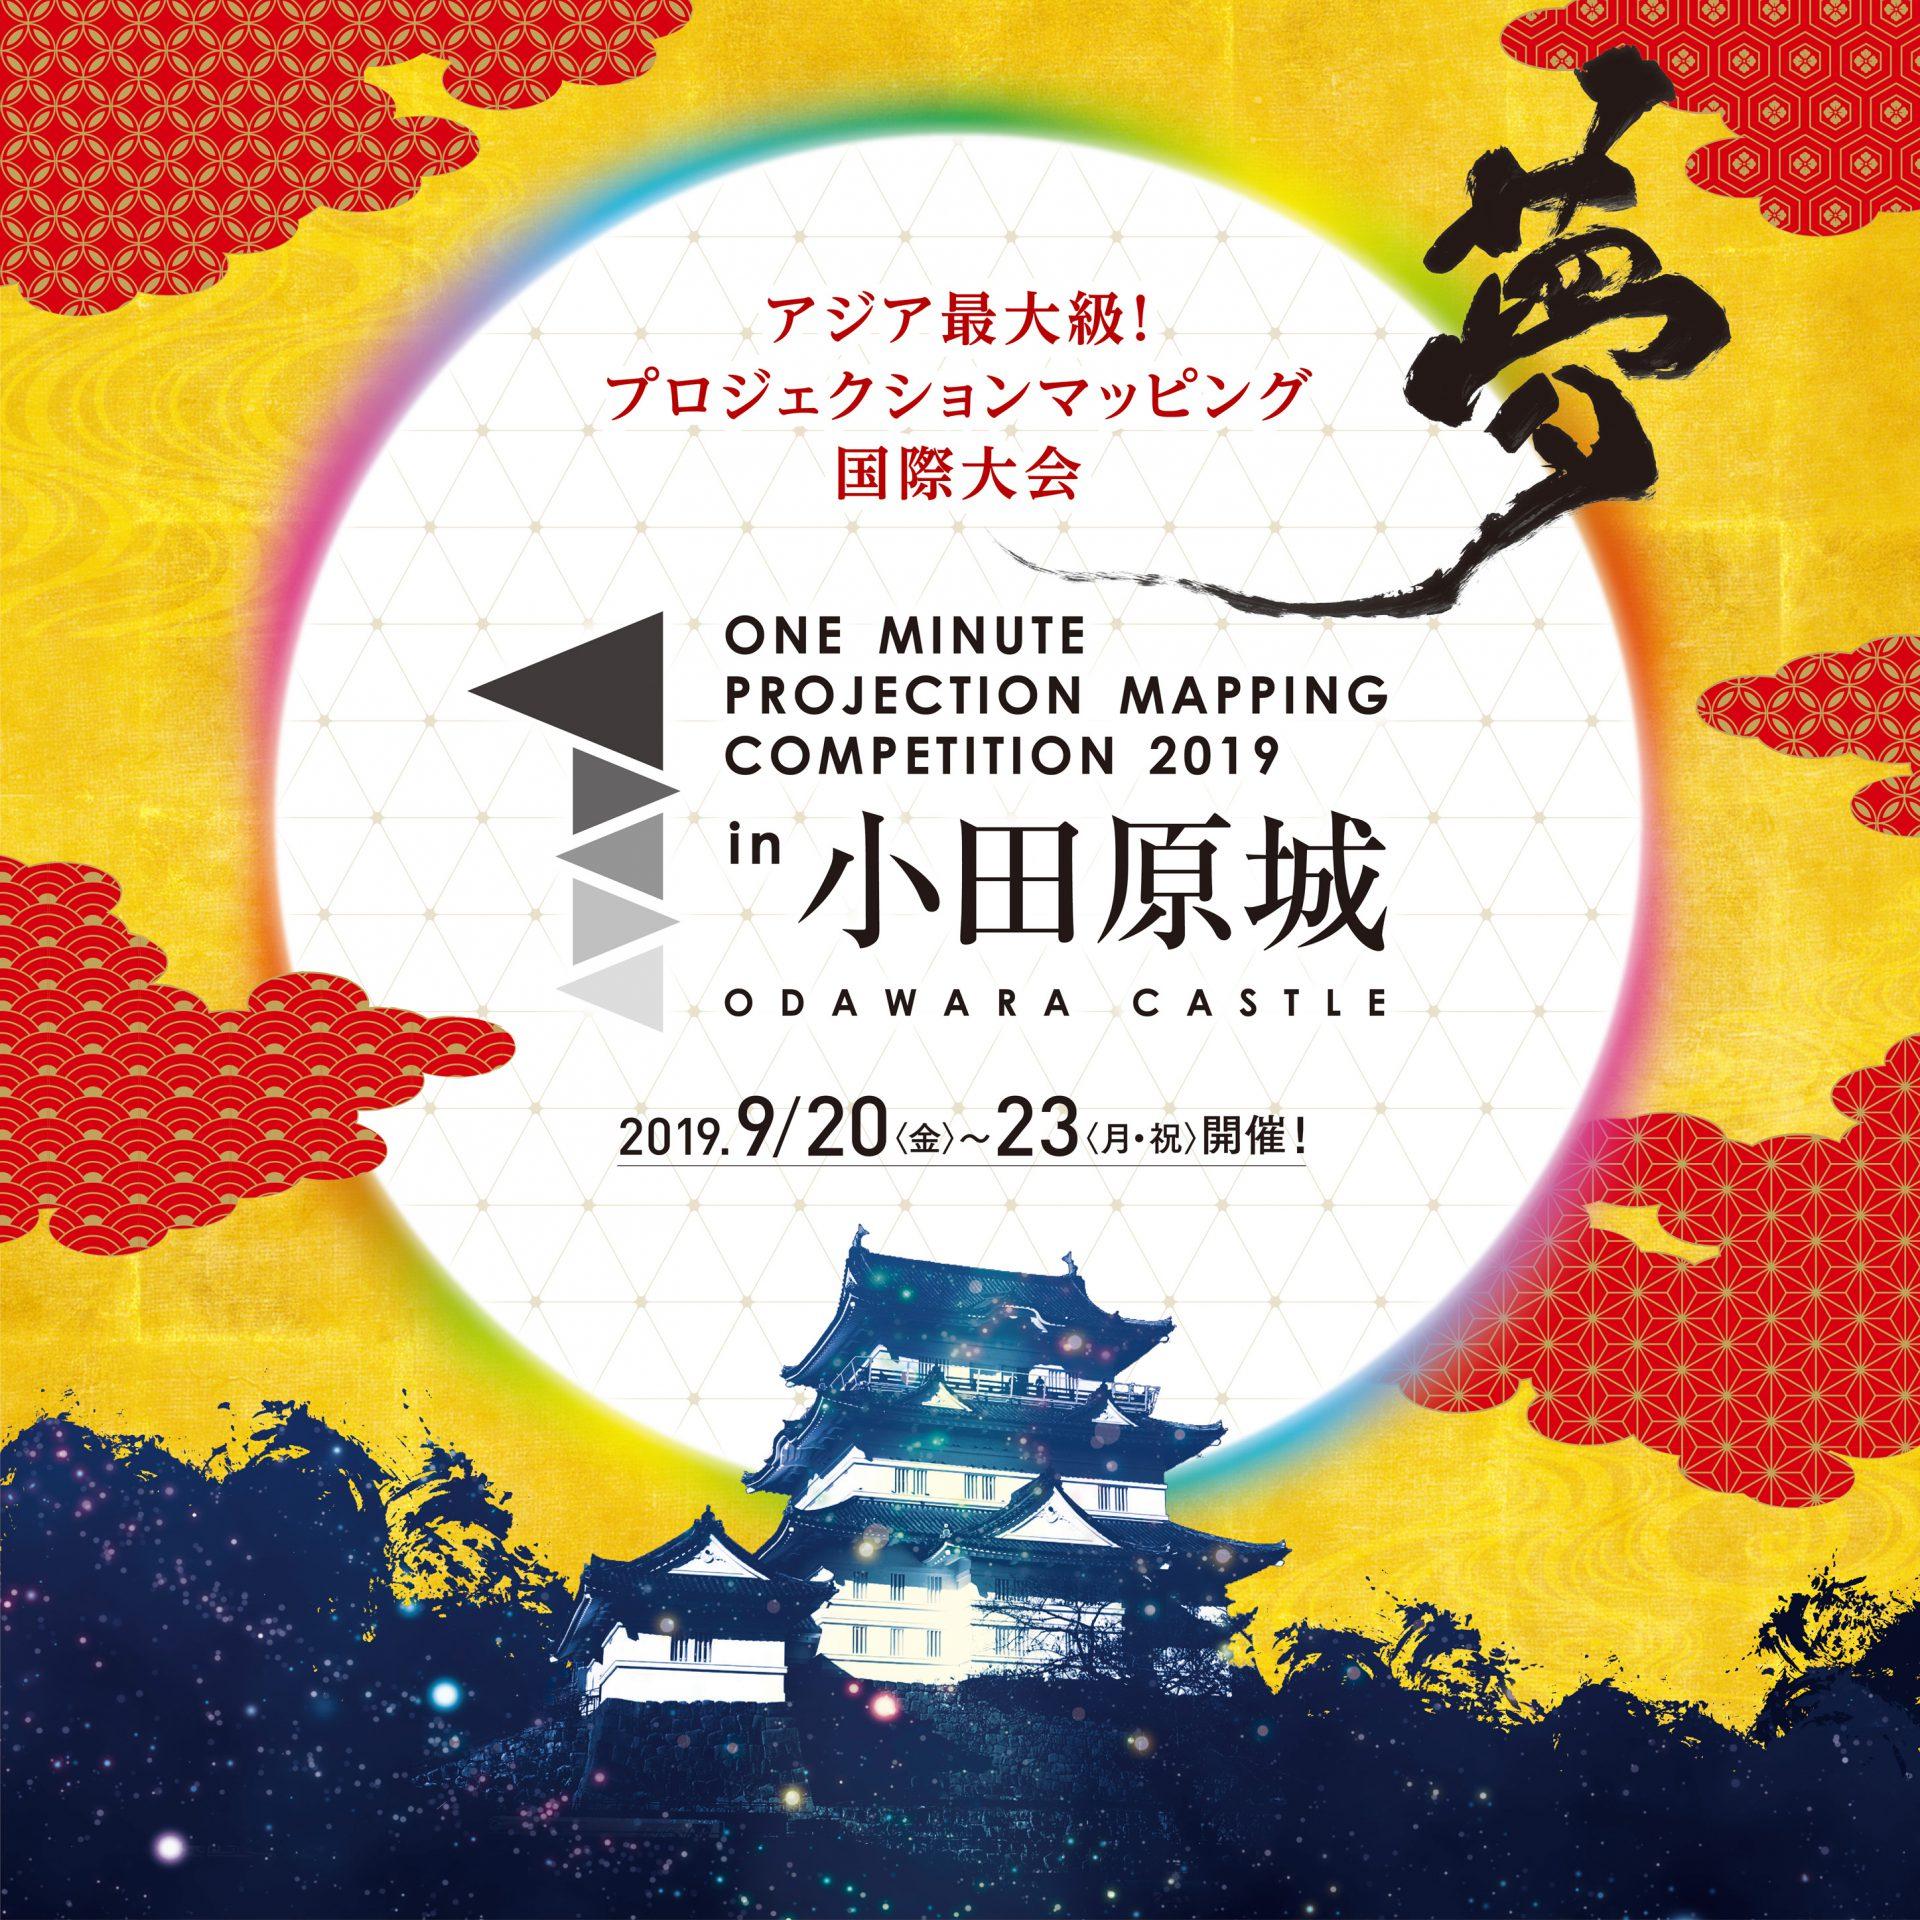 1minuteProjectionMapping in小田原城のキービジュアル